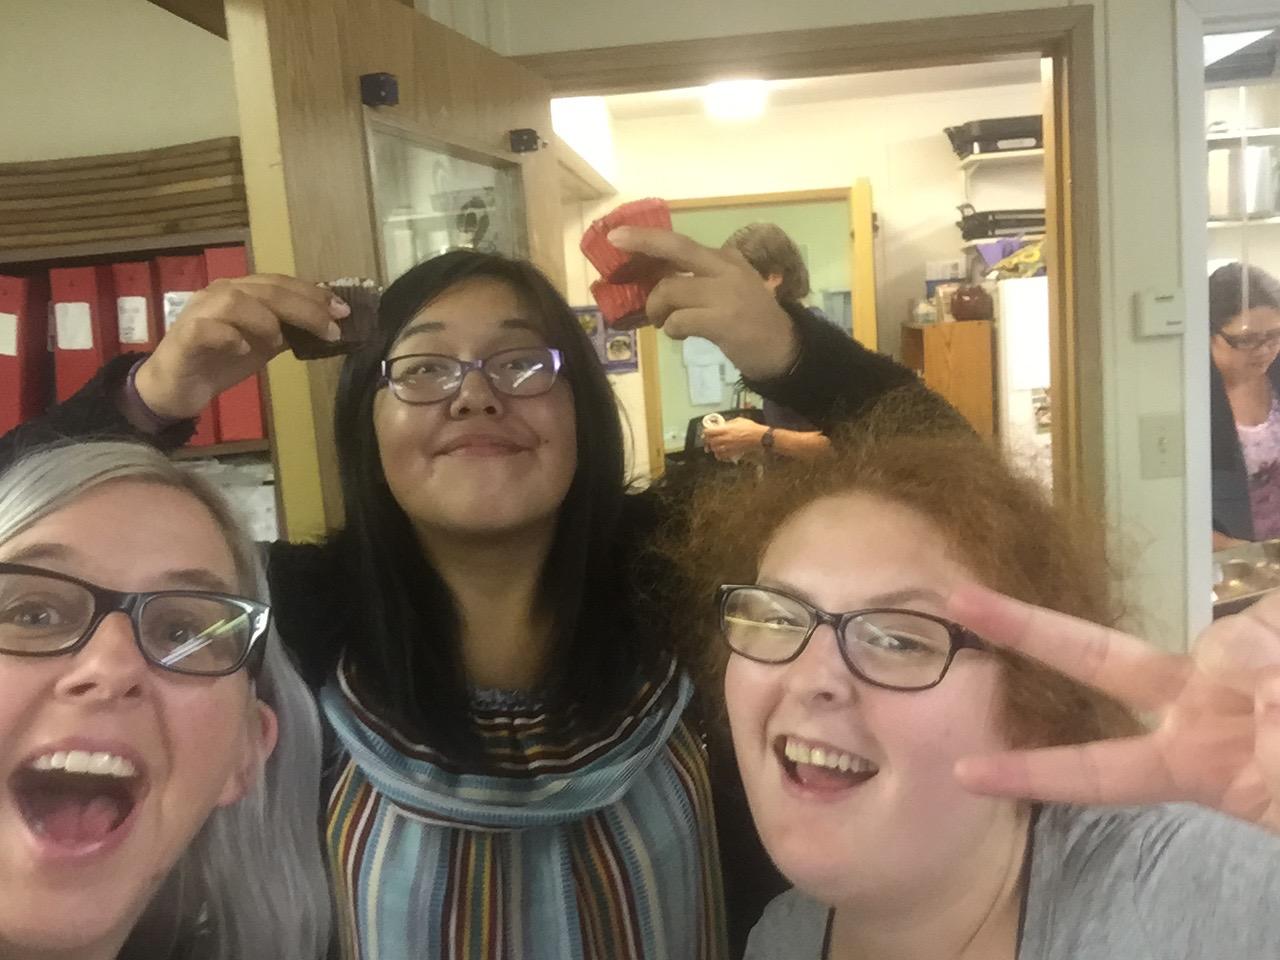 Every screening needs some post screening selfies! Robert, Lisa g and Shay! YAY!